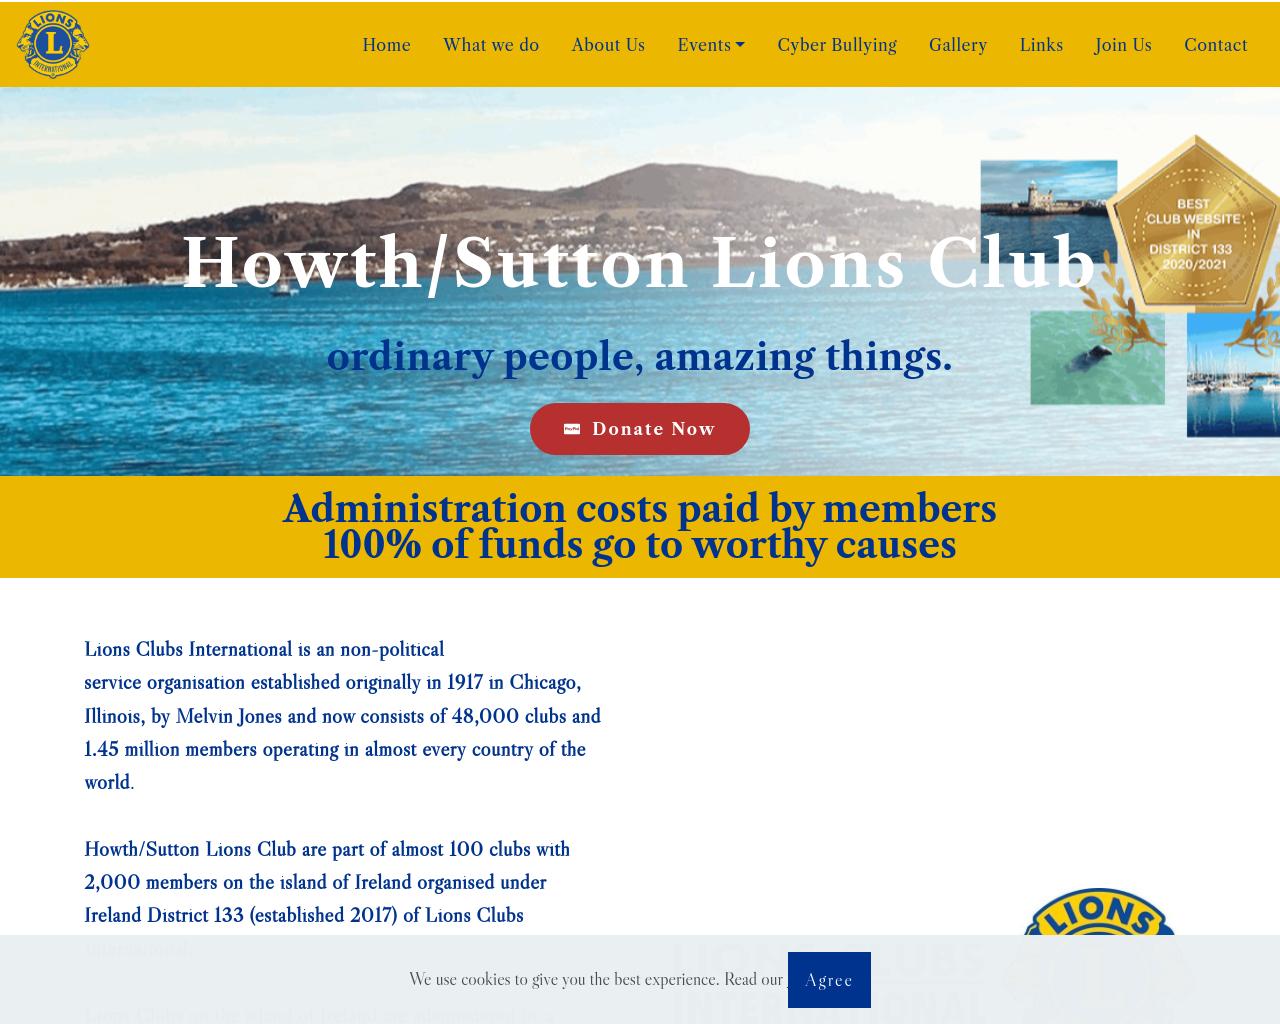 Howth Sutton Lions Club